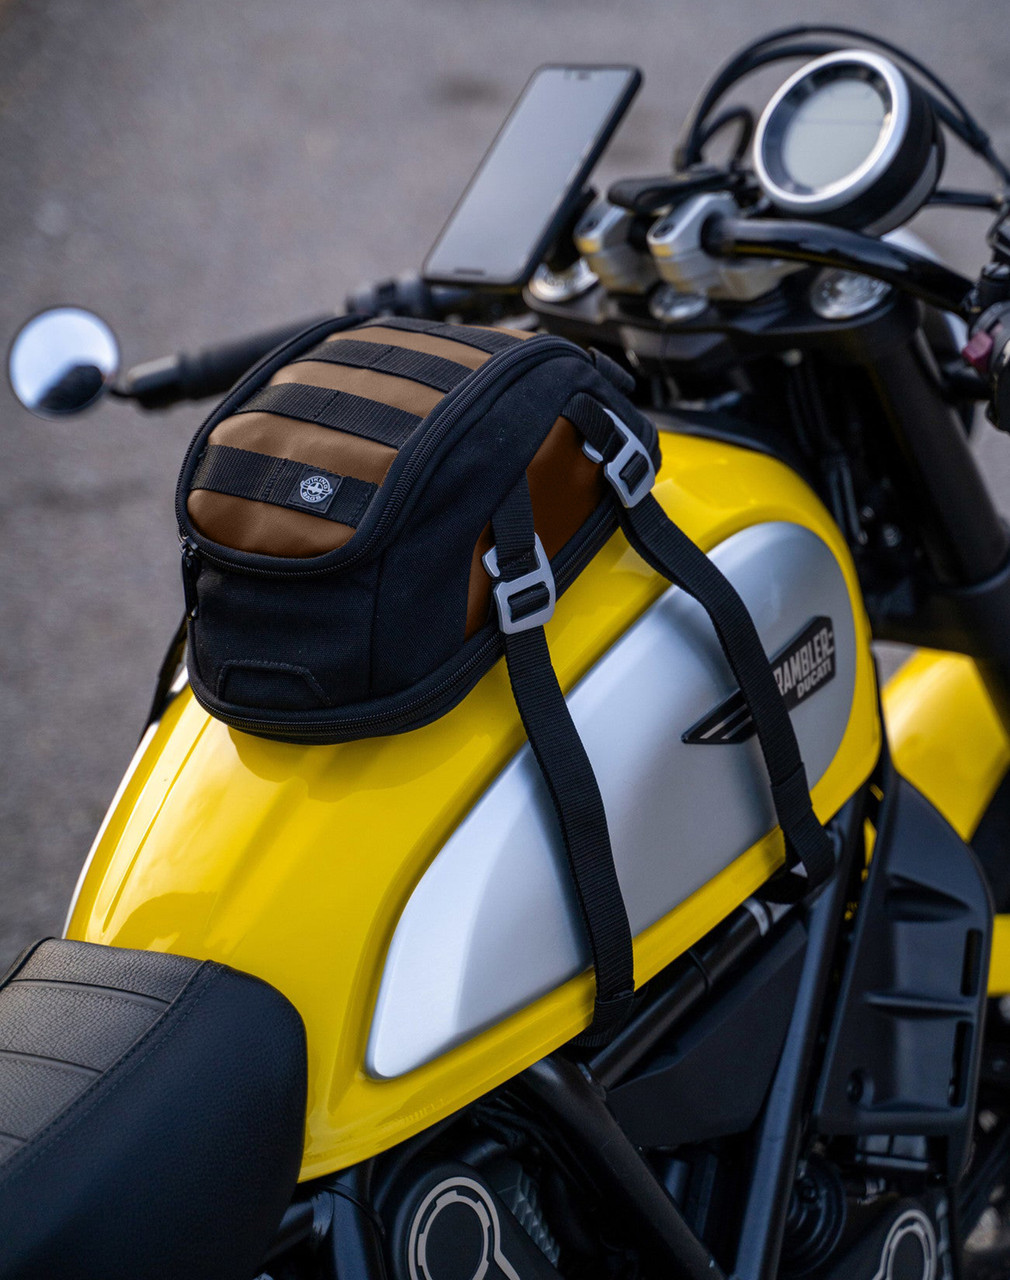 Viking Bonafide Brown Motorcycle Cafe Racer Tank Bag  Bag on Bike View